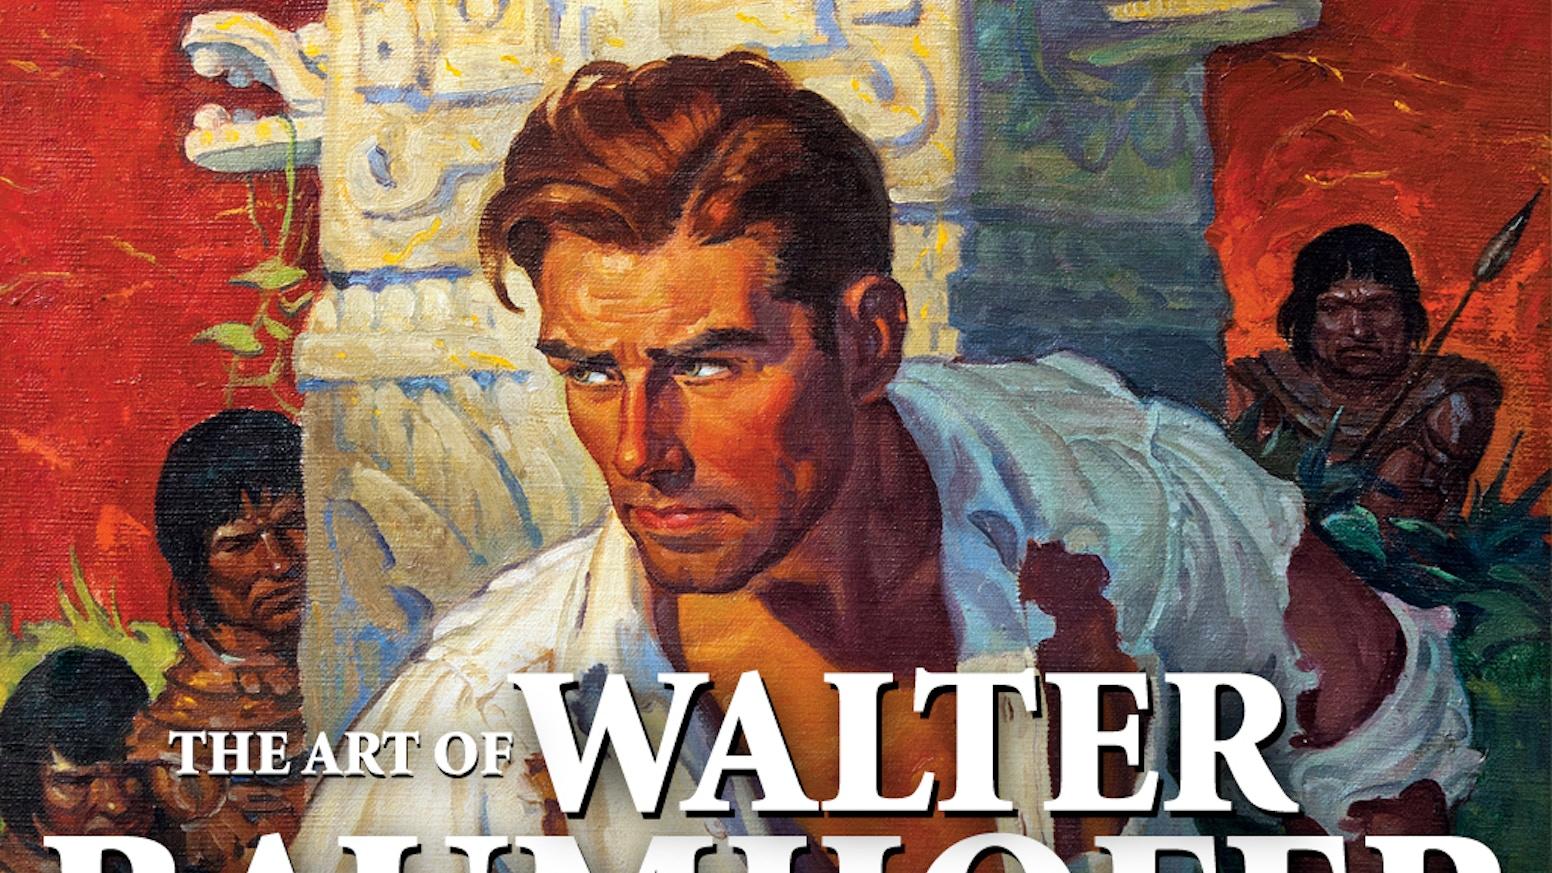 Walter Baumhofer By David Saunders By The Illustrated Press Inc Tom Lovell Illustrator Kickstarter